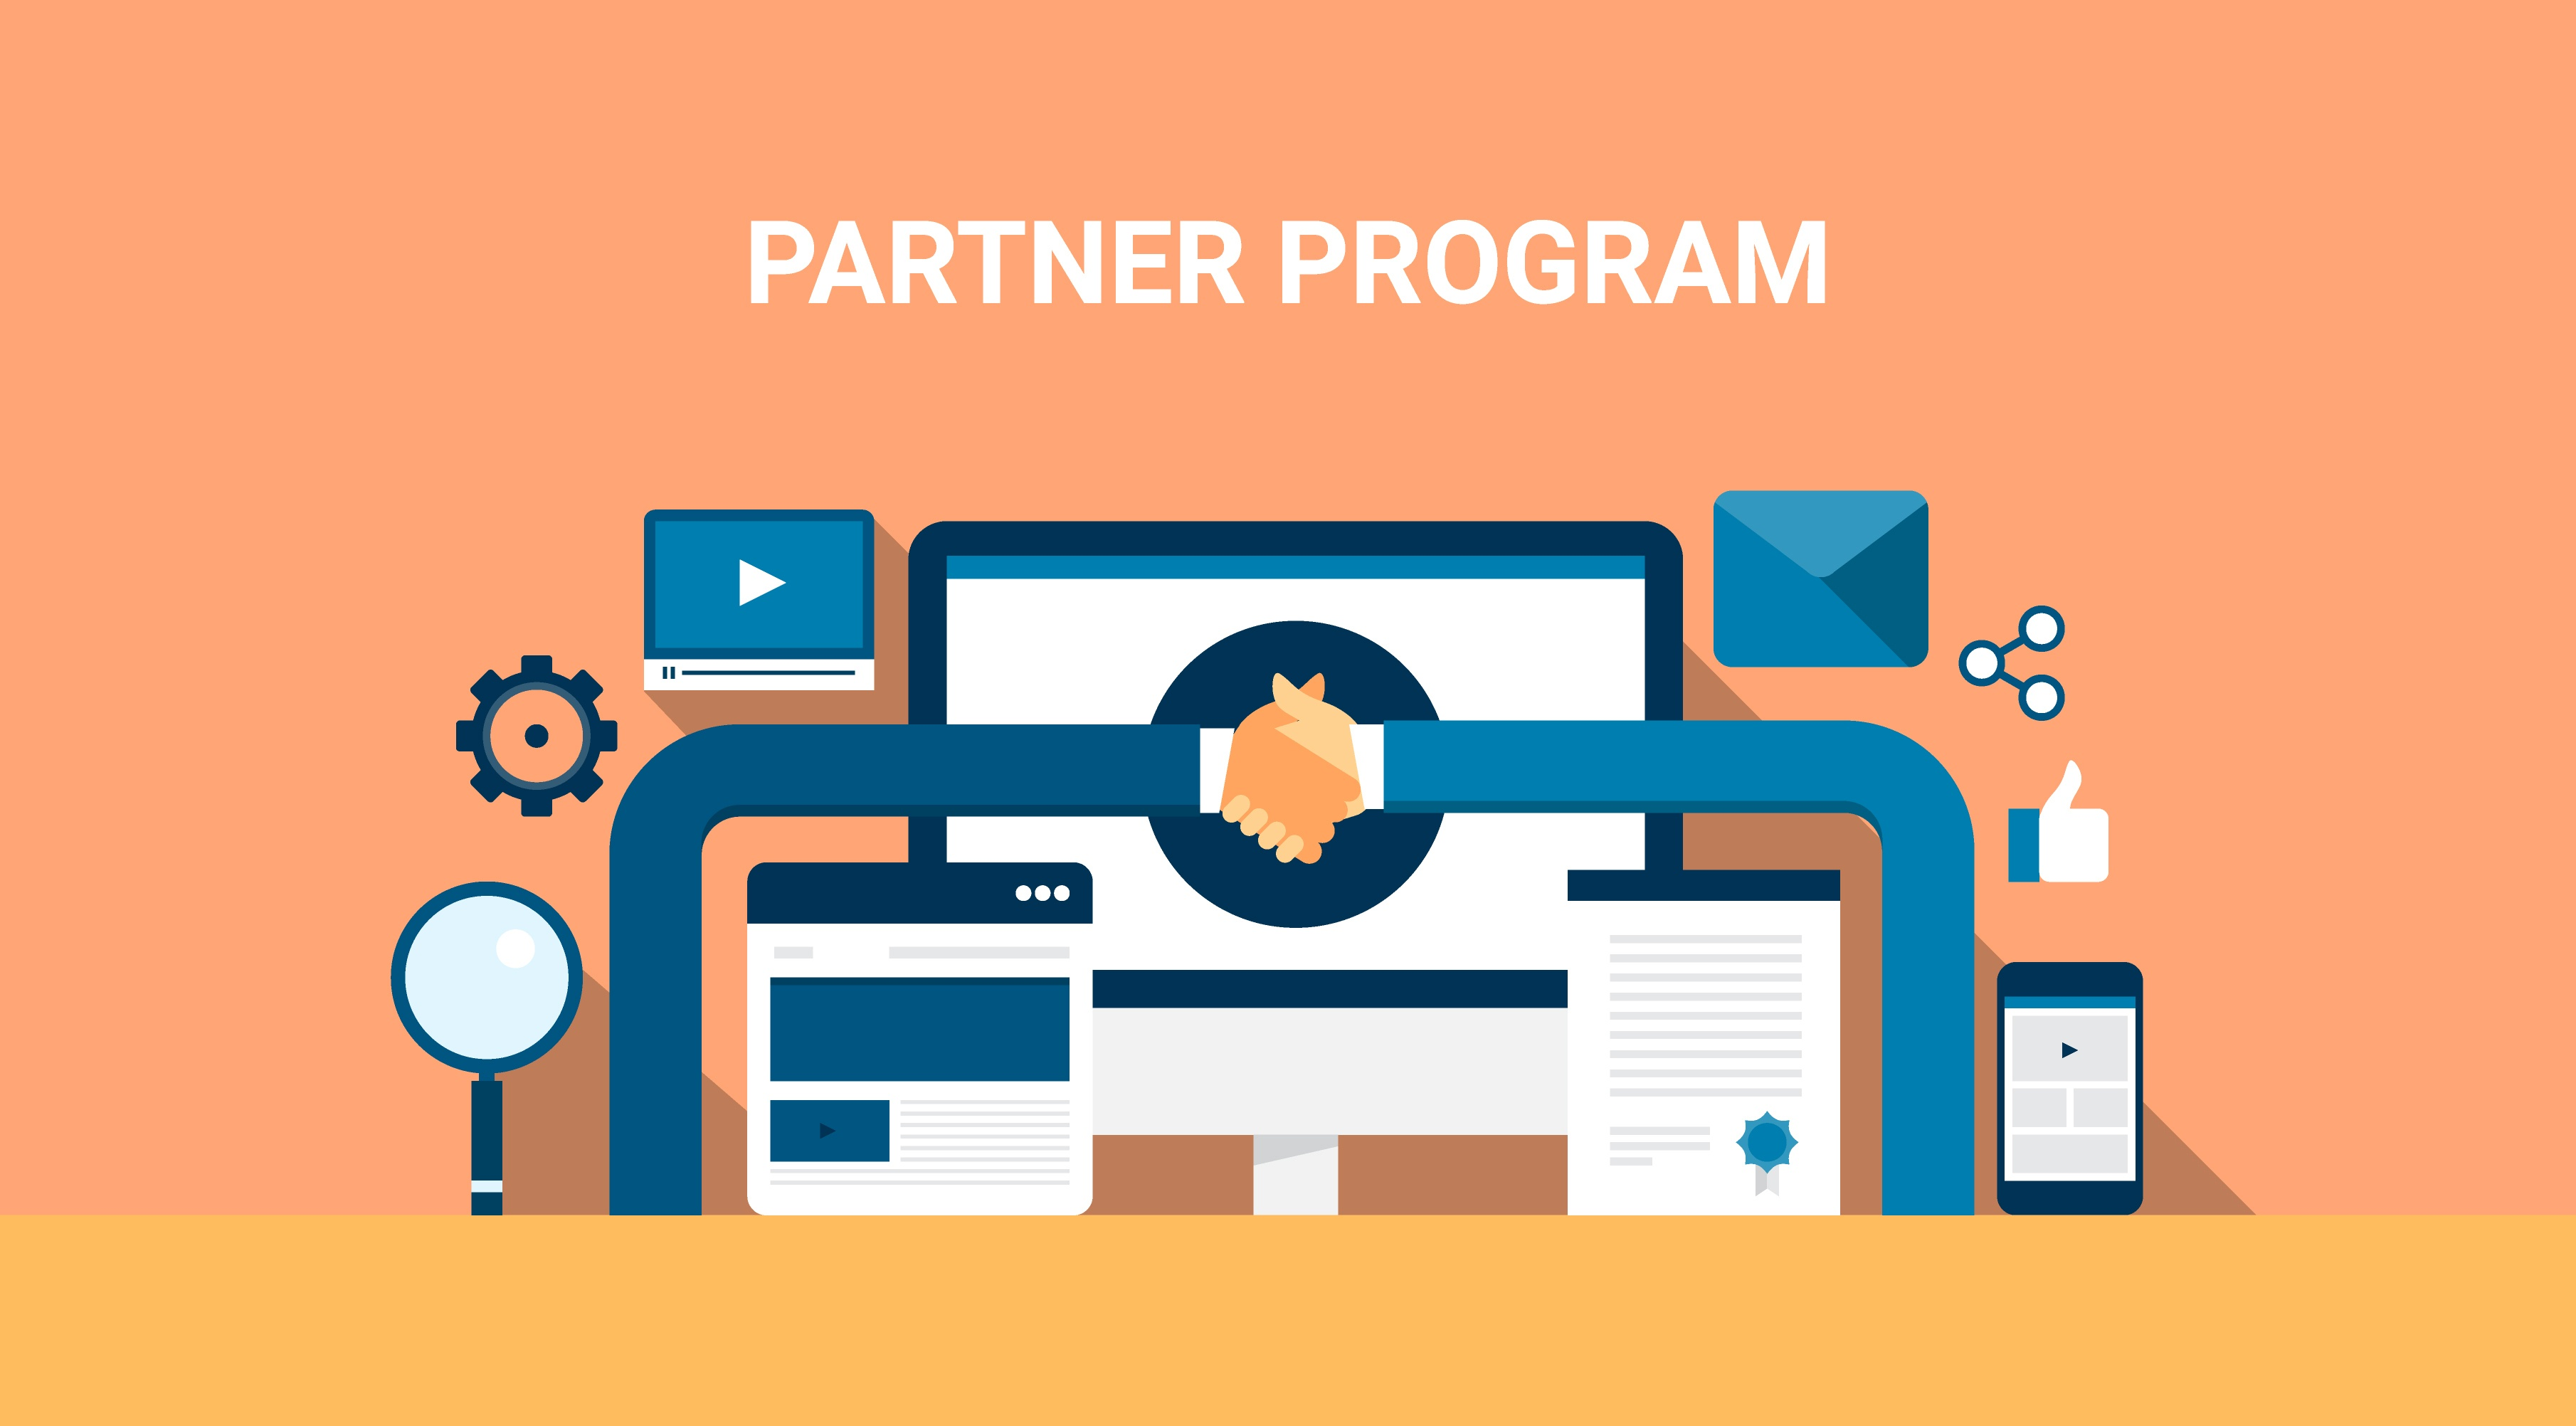 SaaS partner program